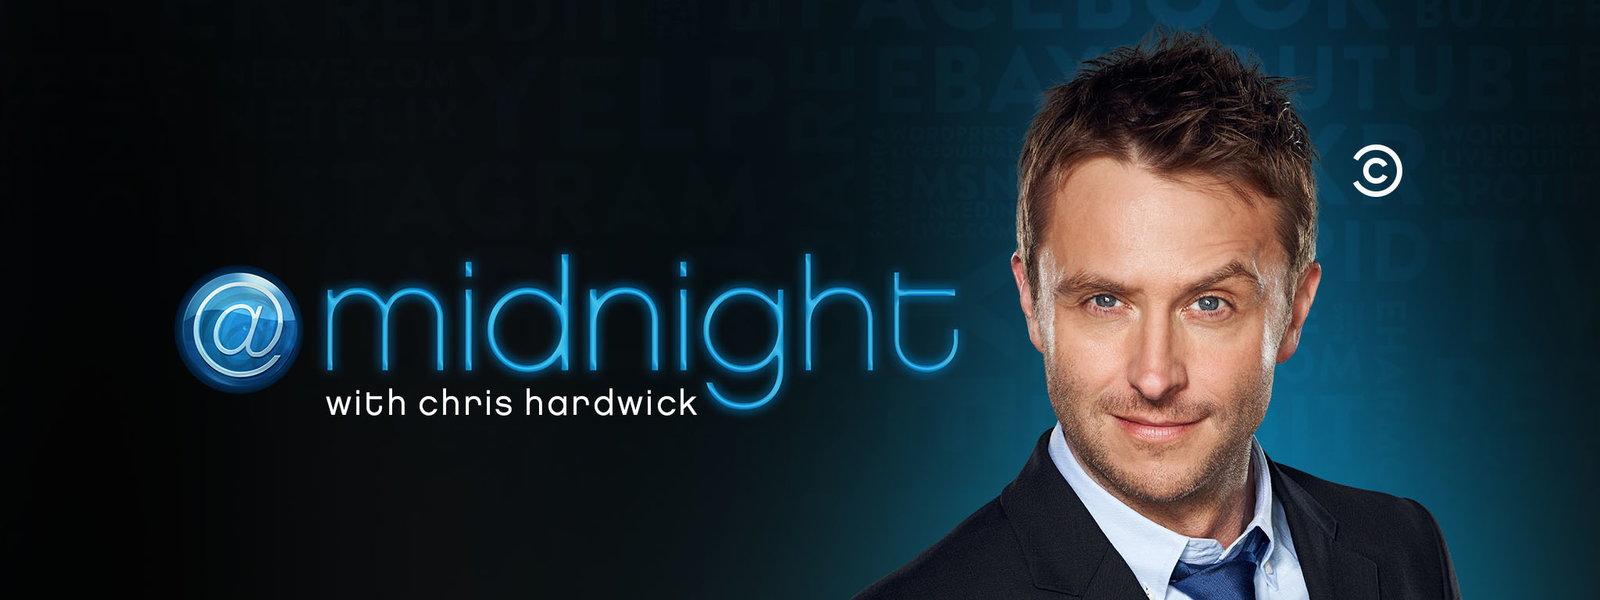 midnight-with-chris-hardwick